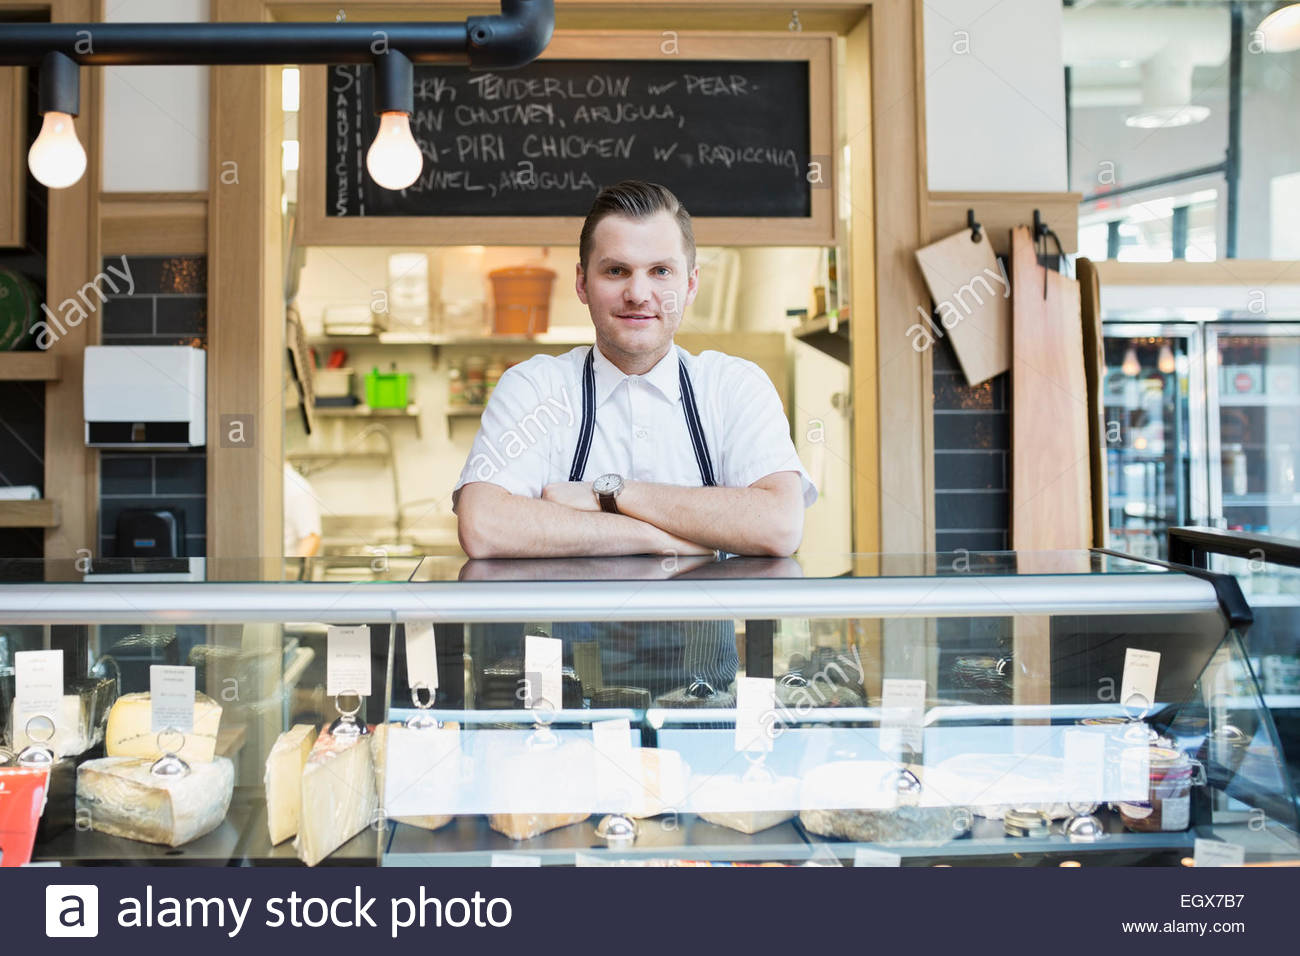 Portrait of confident market owner behind deli case - Stock Image